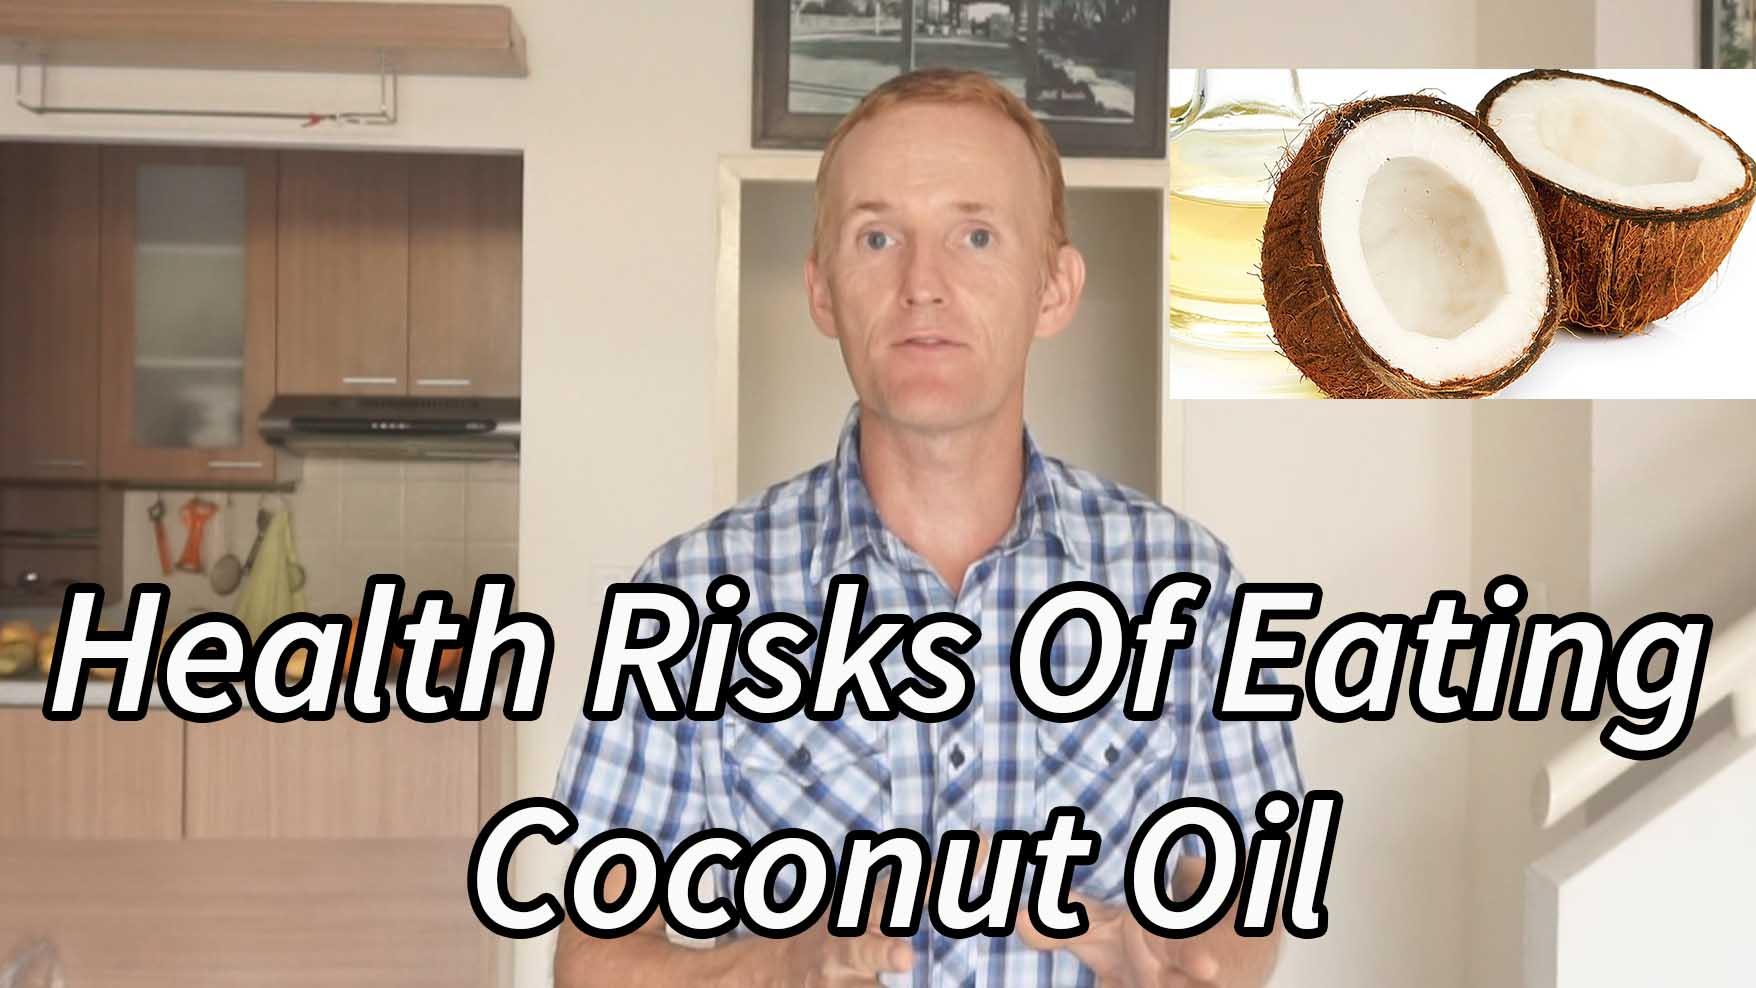 Health Risk Of Eating Coconut Oil